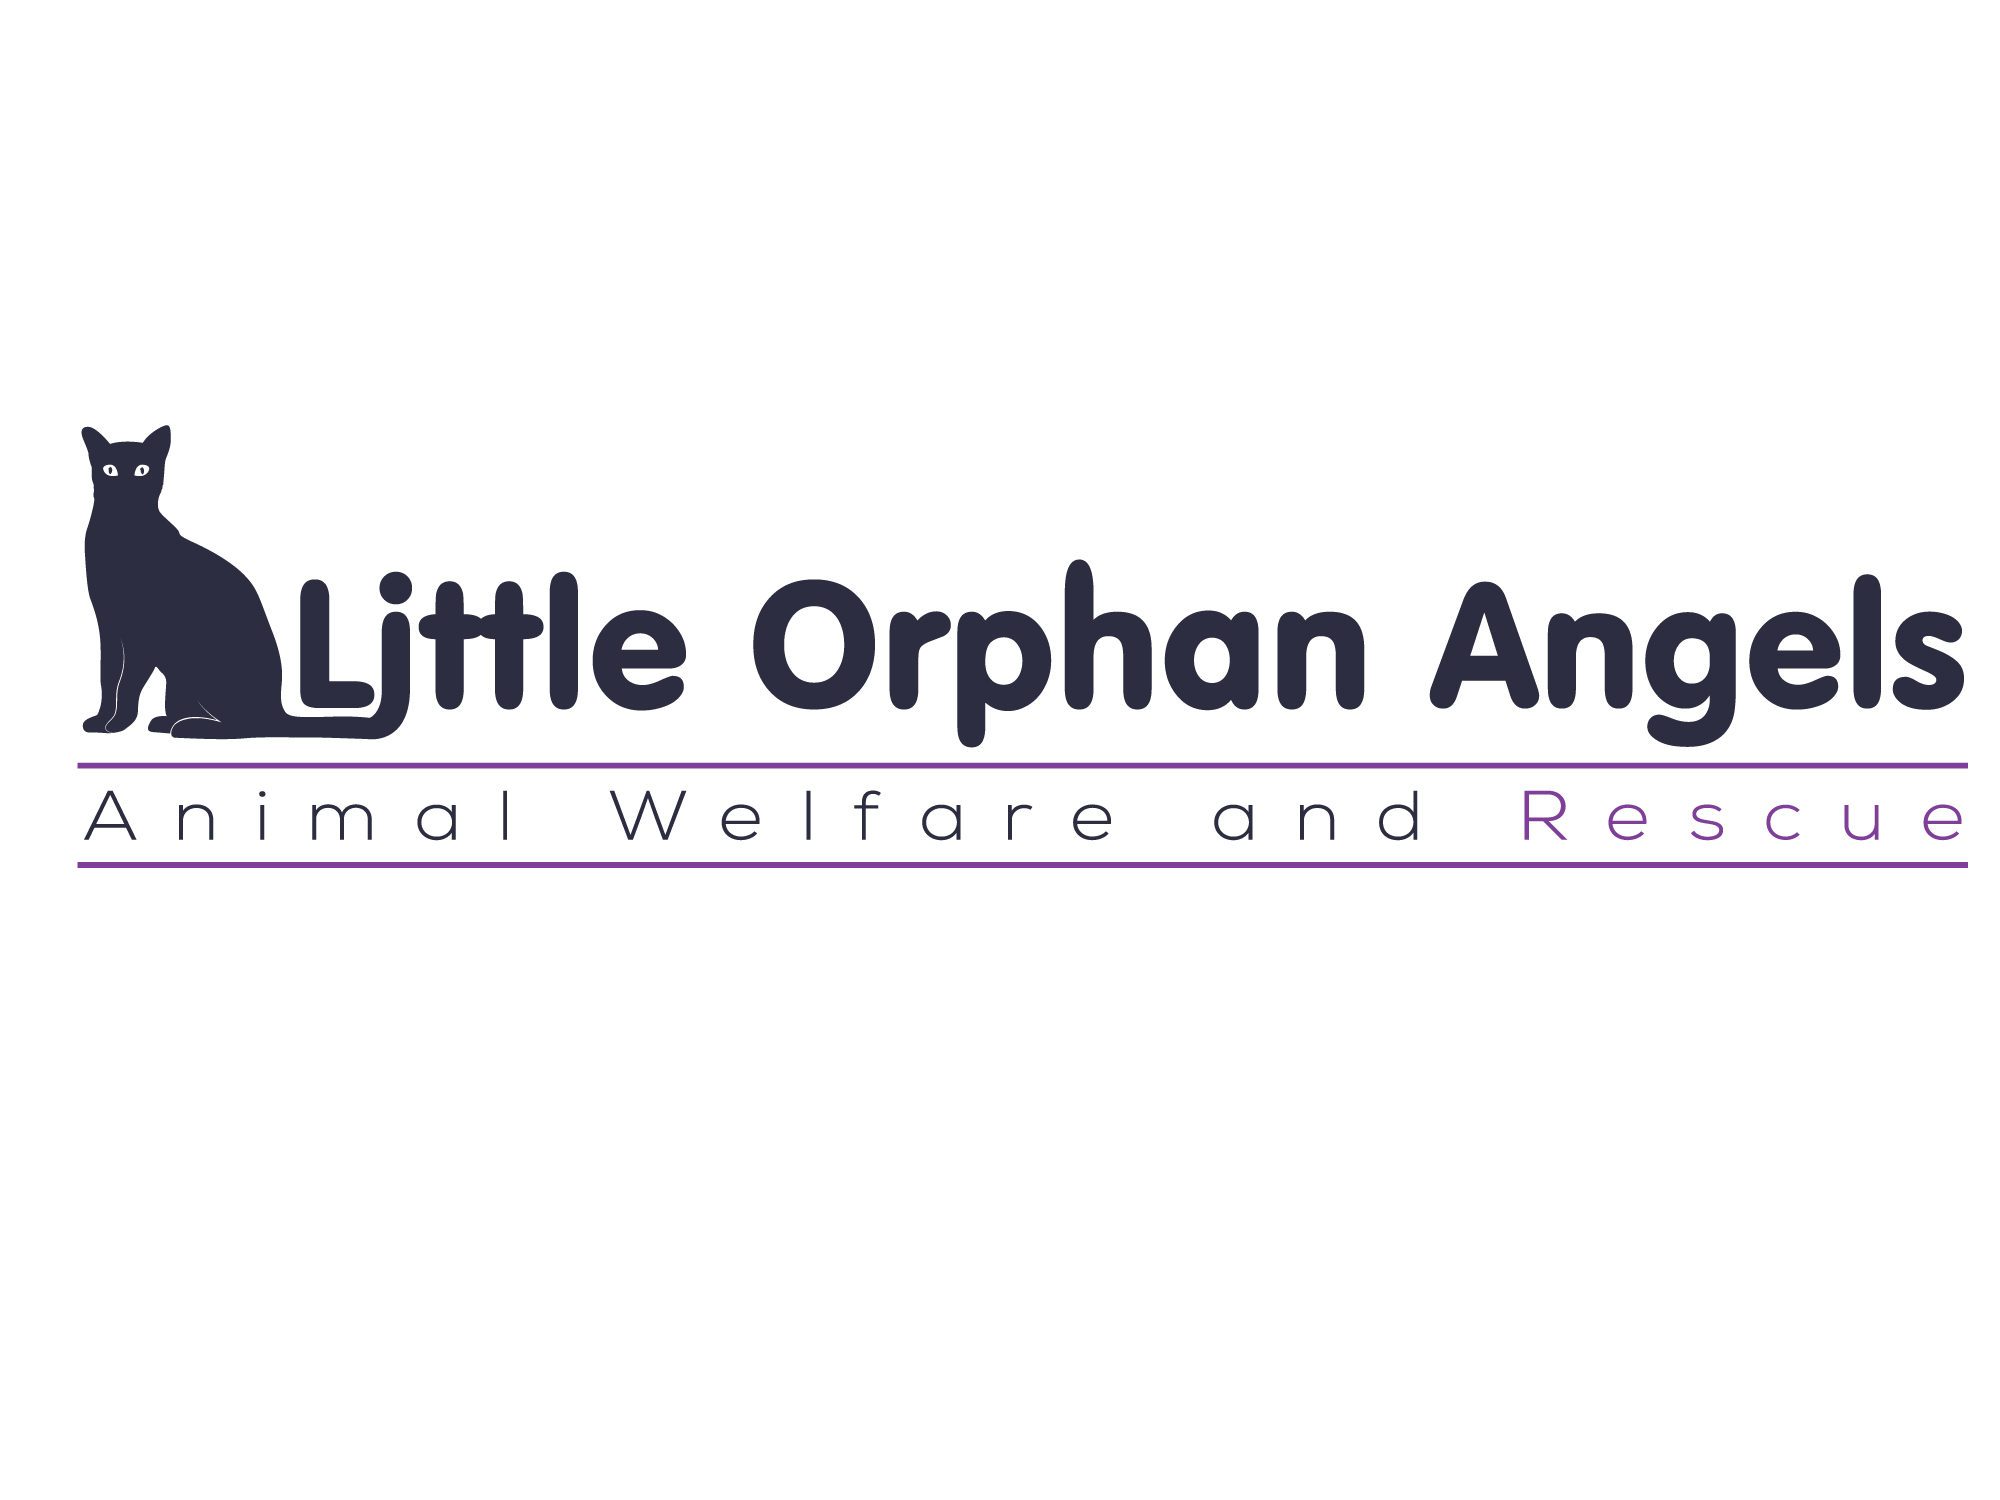 Little Orphan Angels Animal Welfare Agency